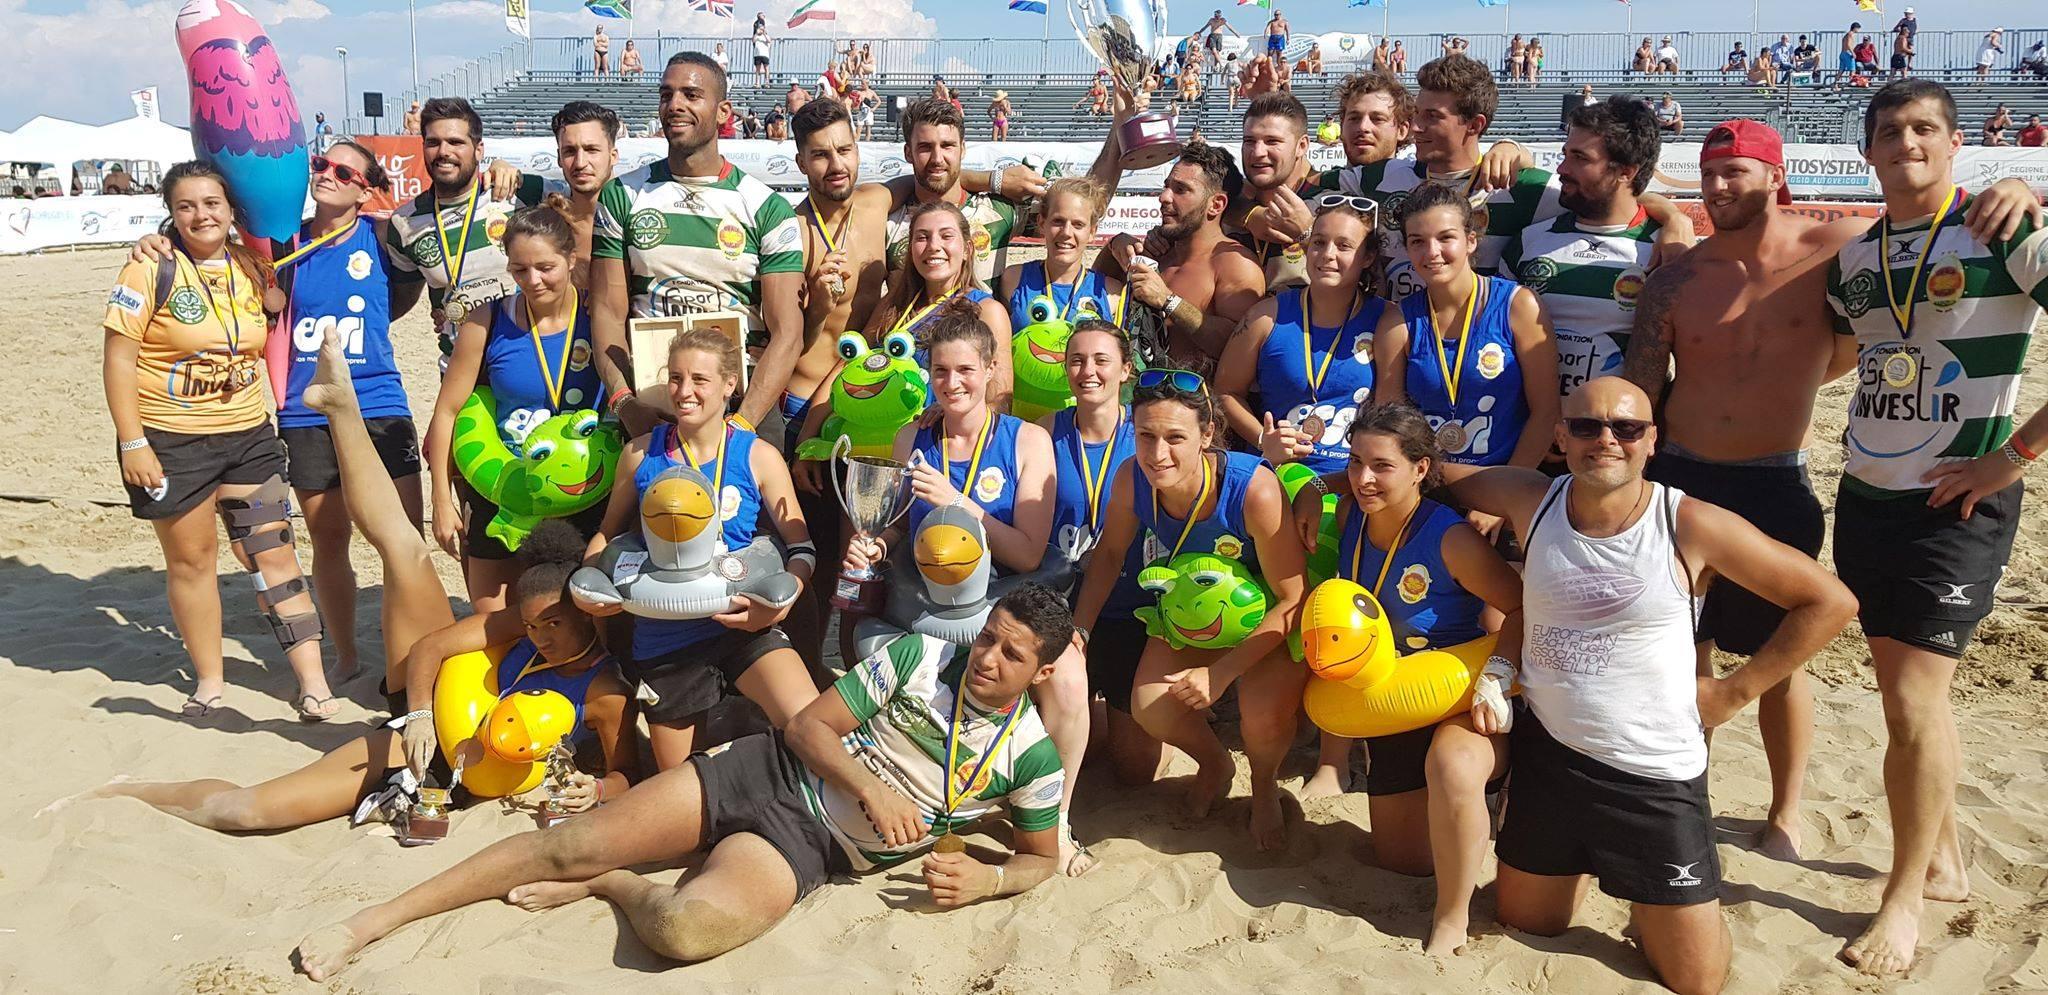 Ovale Beach Marseille champion d'Europe * 2